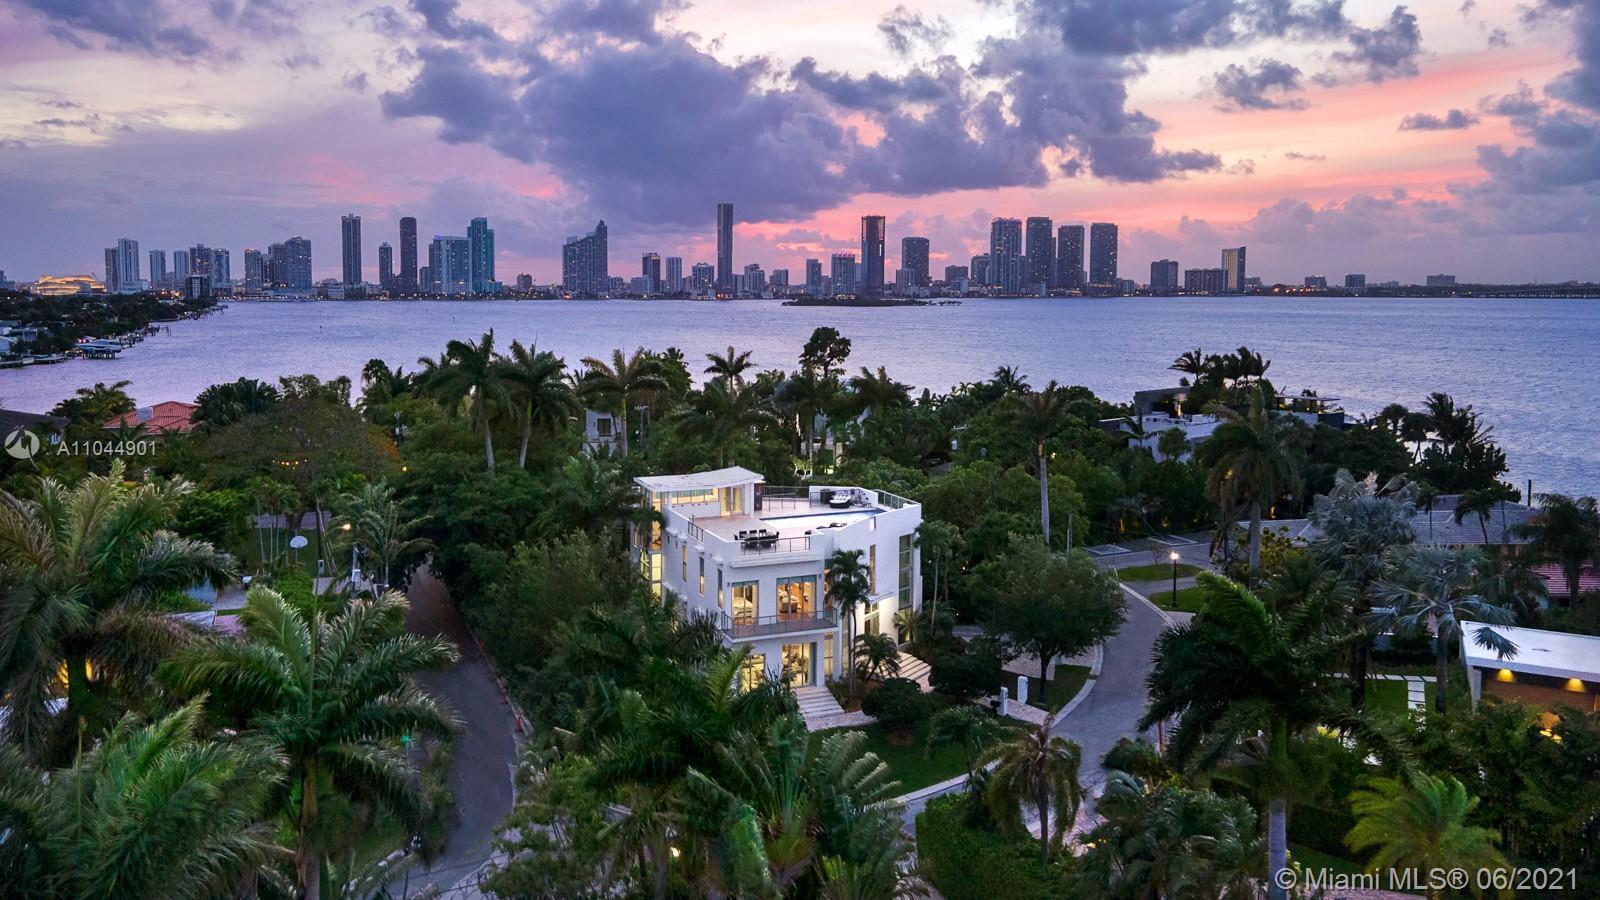 400 San Marino Dr, Miami Beach, Florida 33139